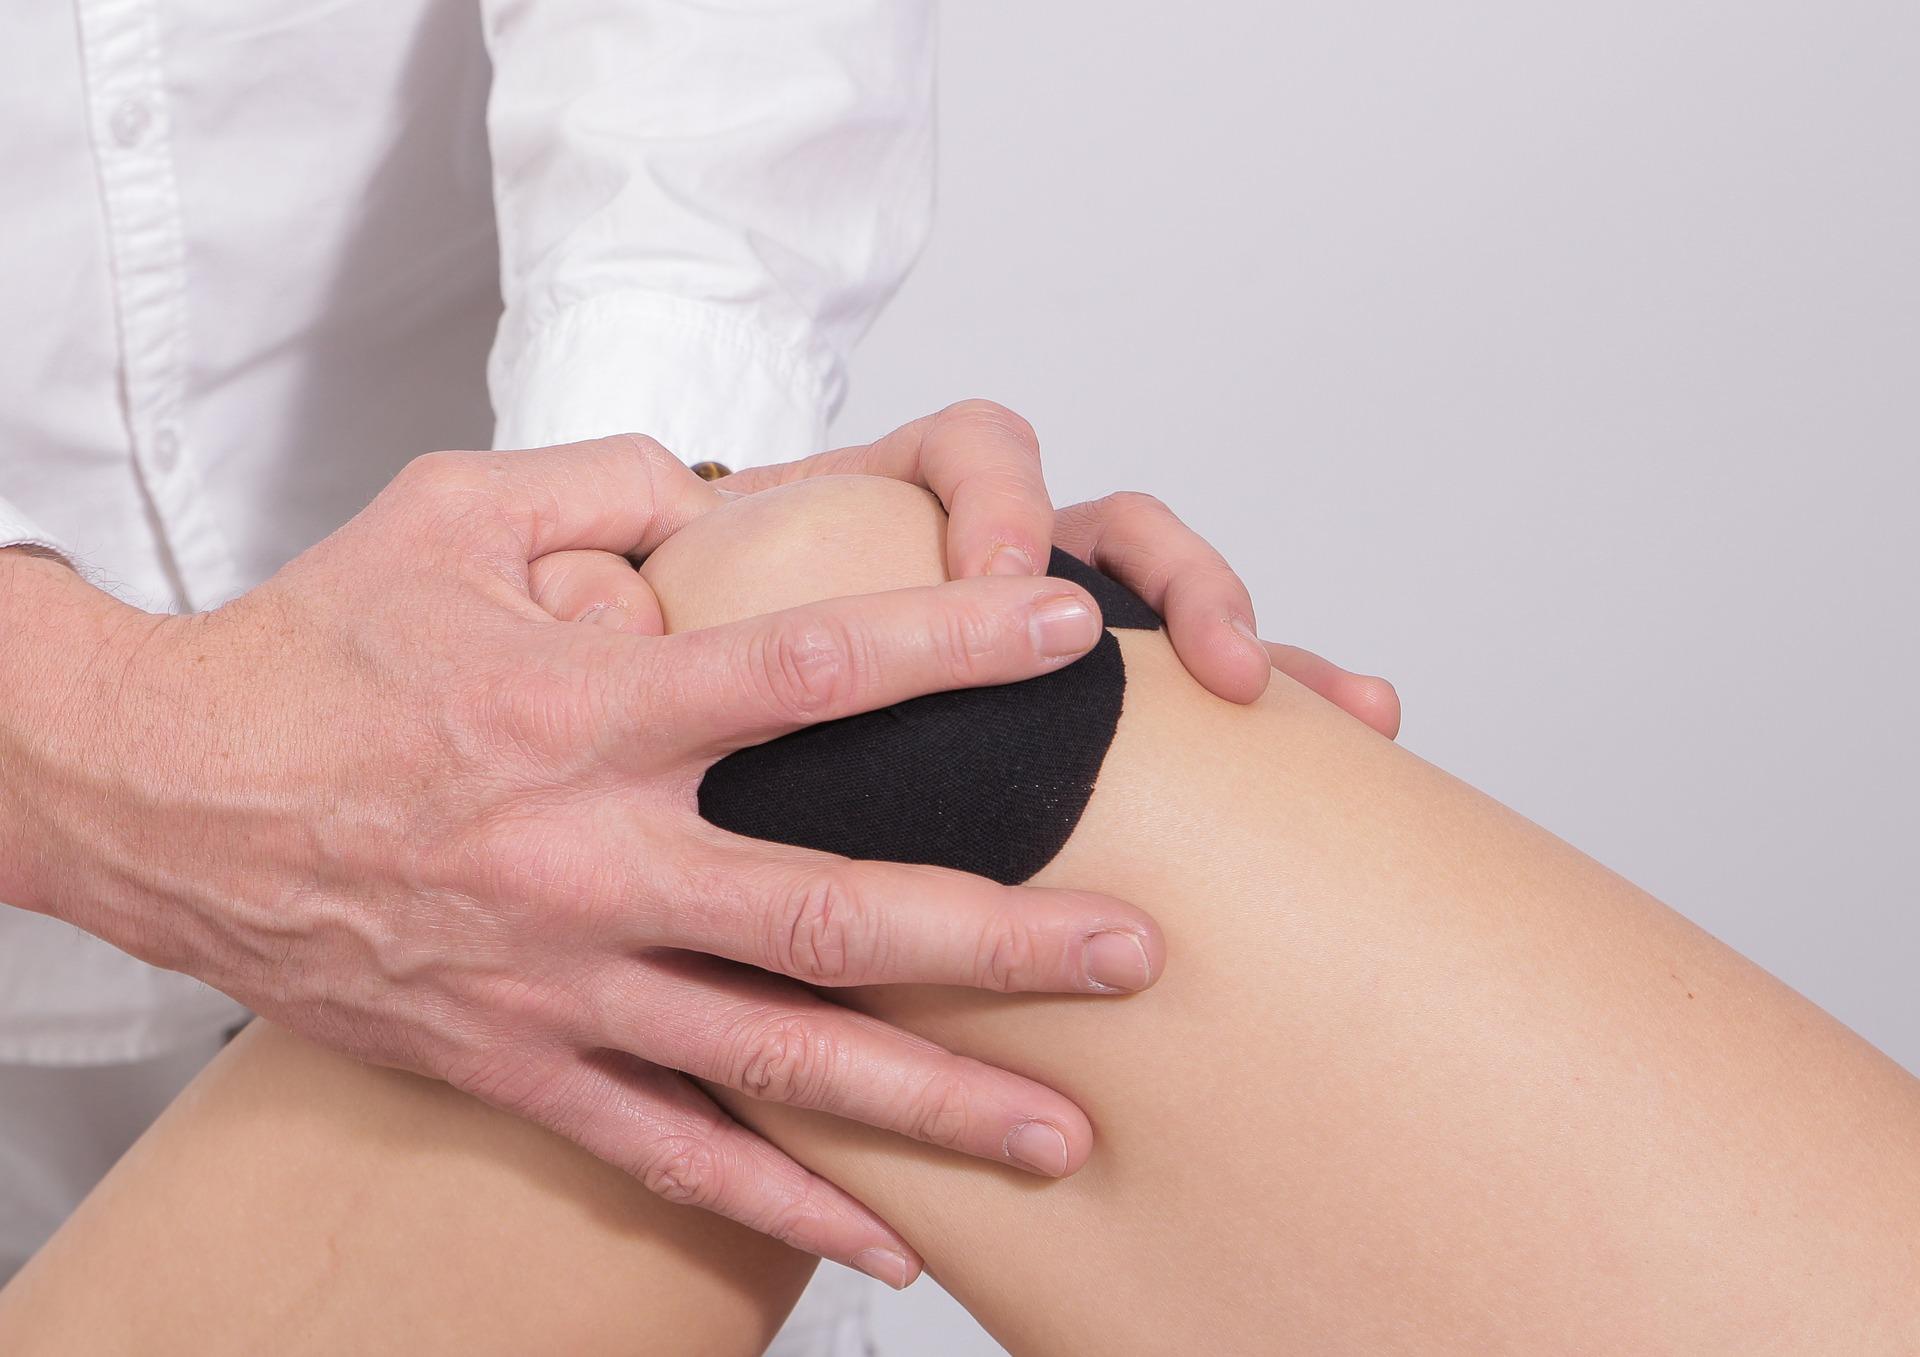 Medical tape, elastisch tape, sportblessures, knie blessure, schouder blessure, tennis elleboog